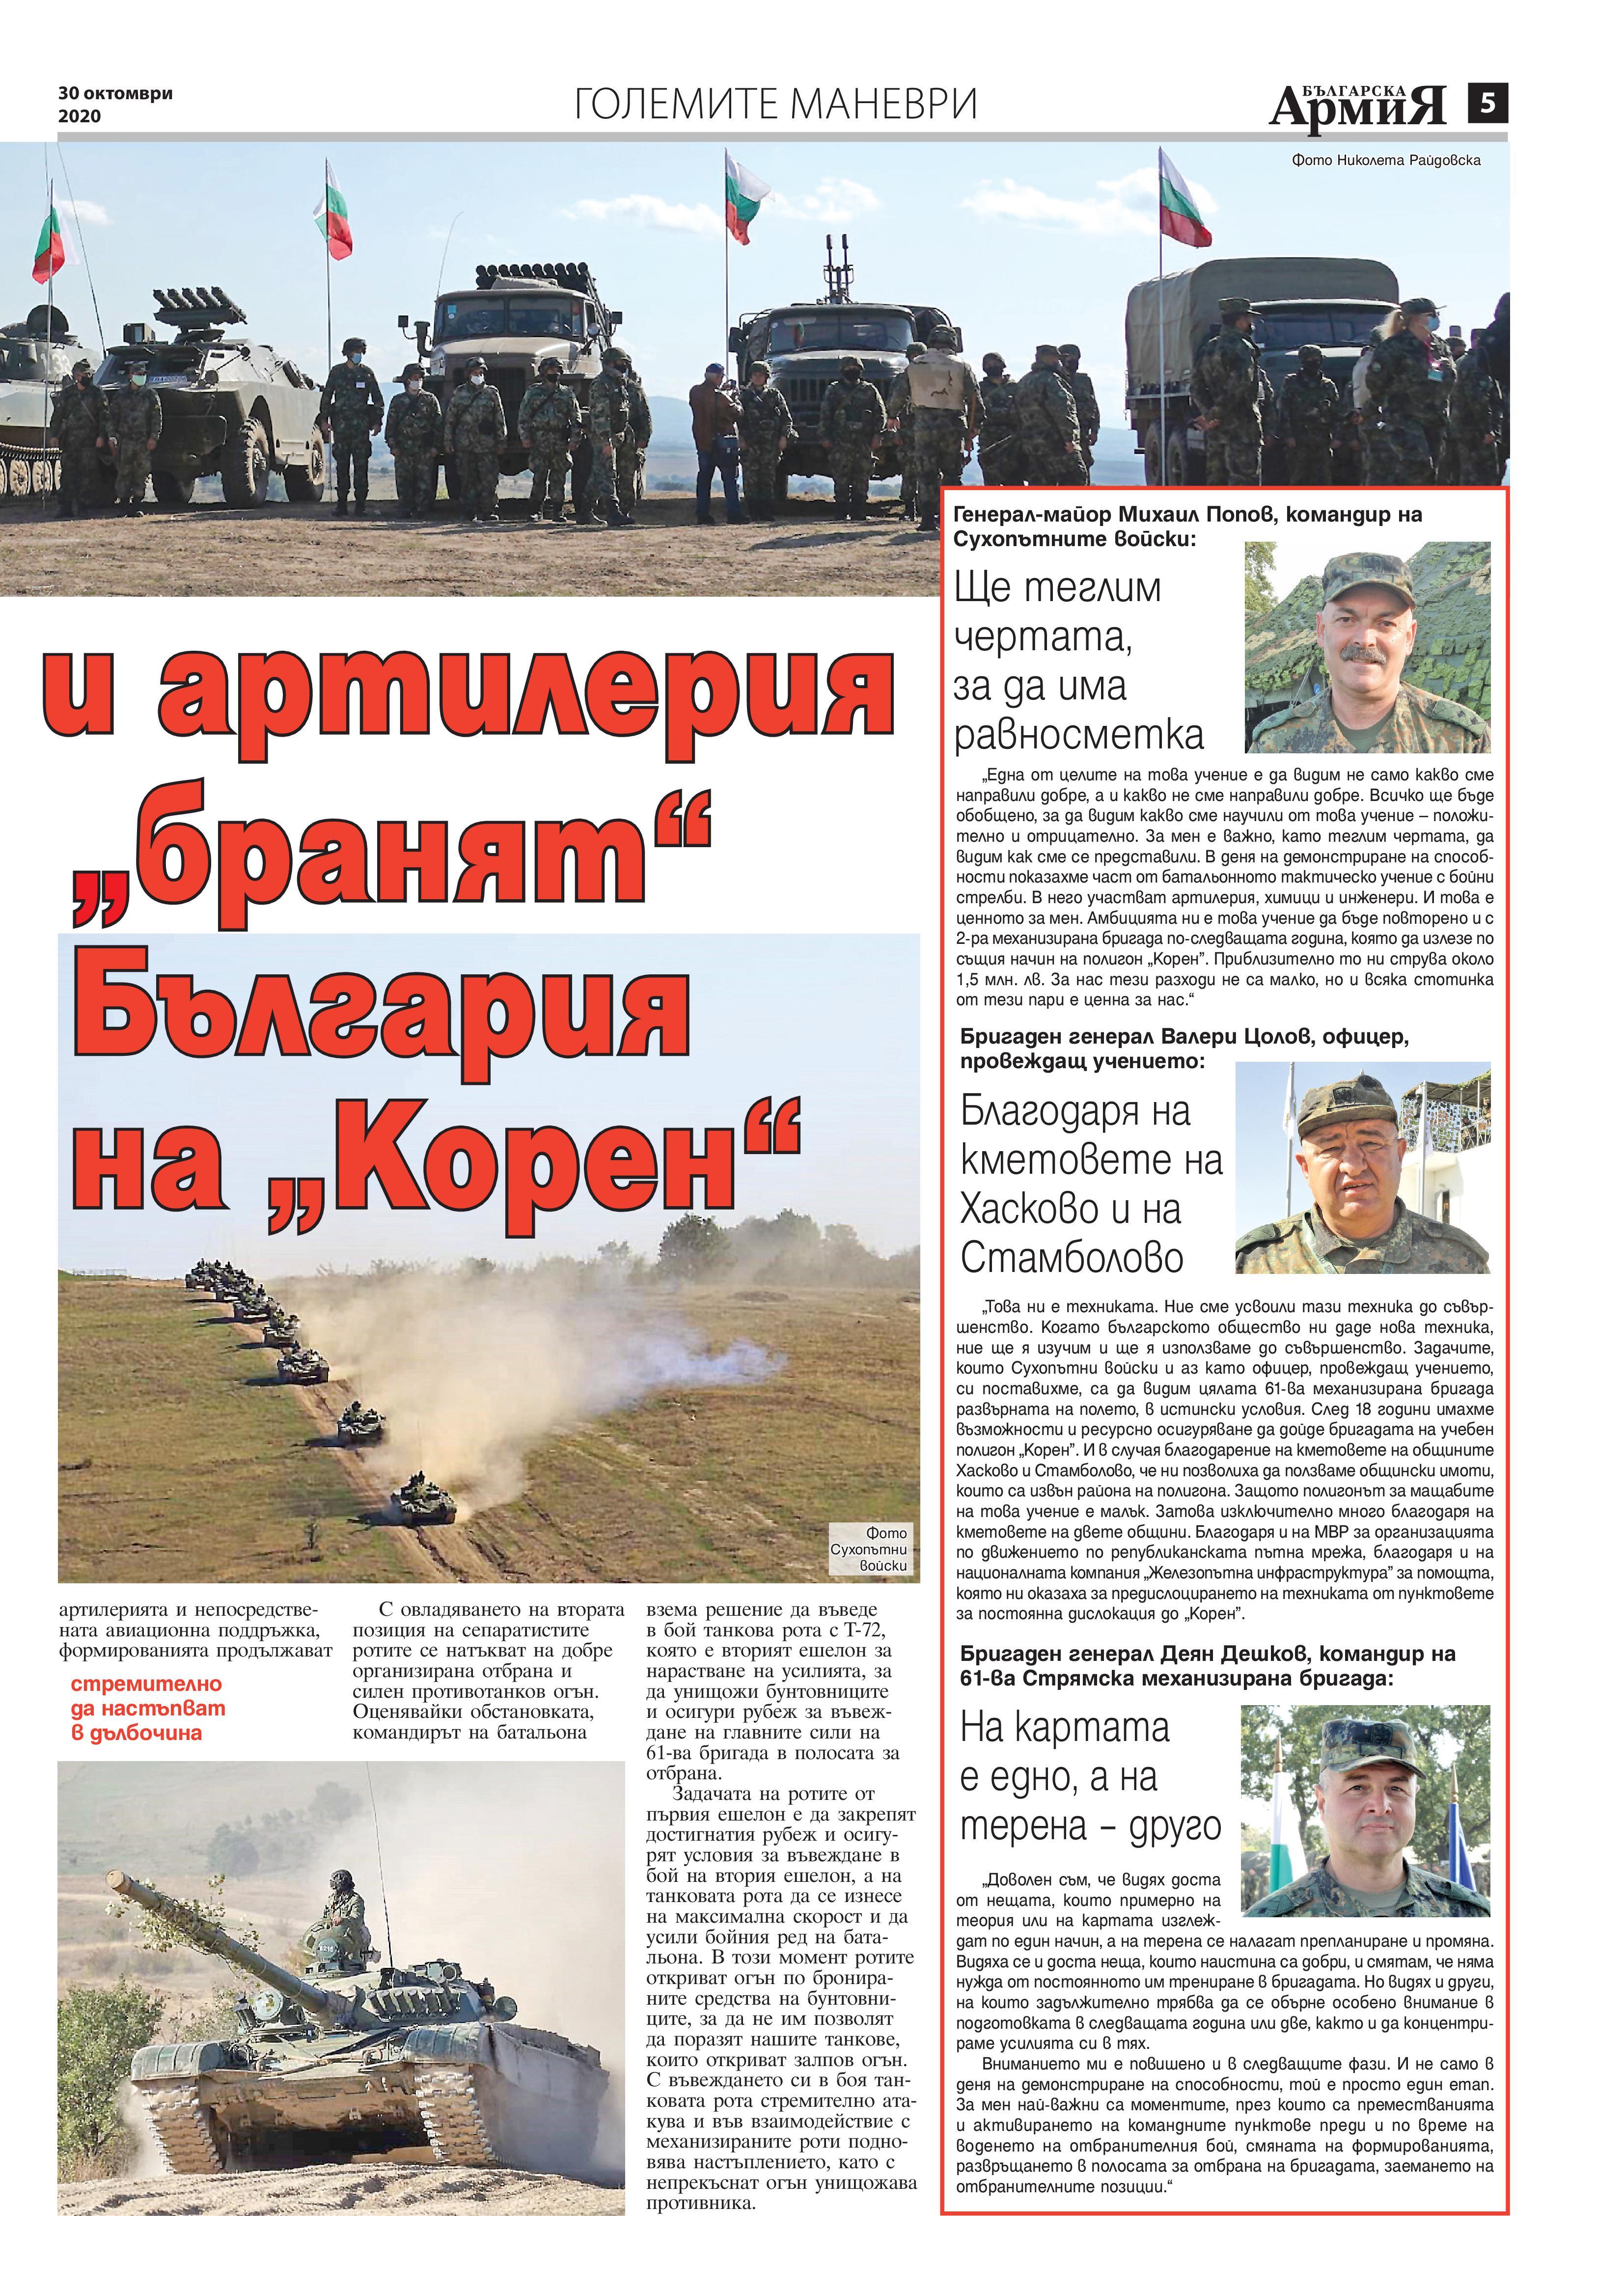 https://armymedia.bg/wp-content/uploads/2015/06/05-45.jpg